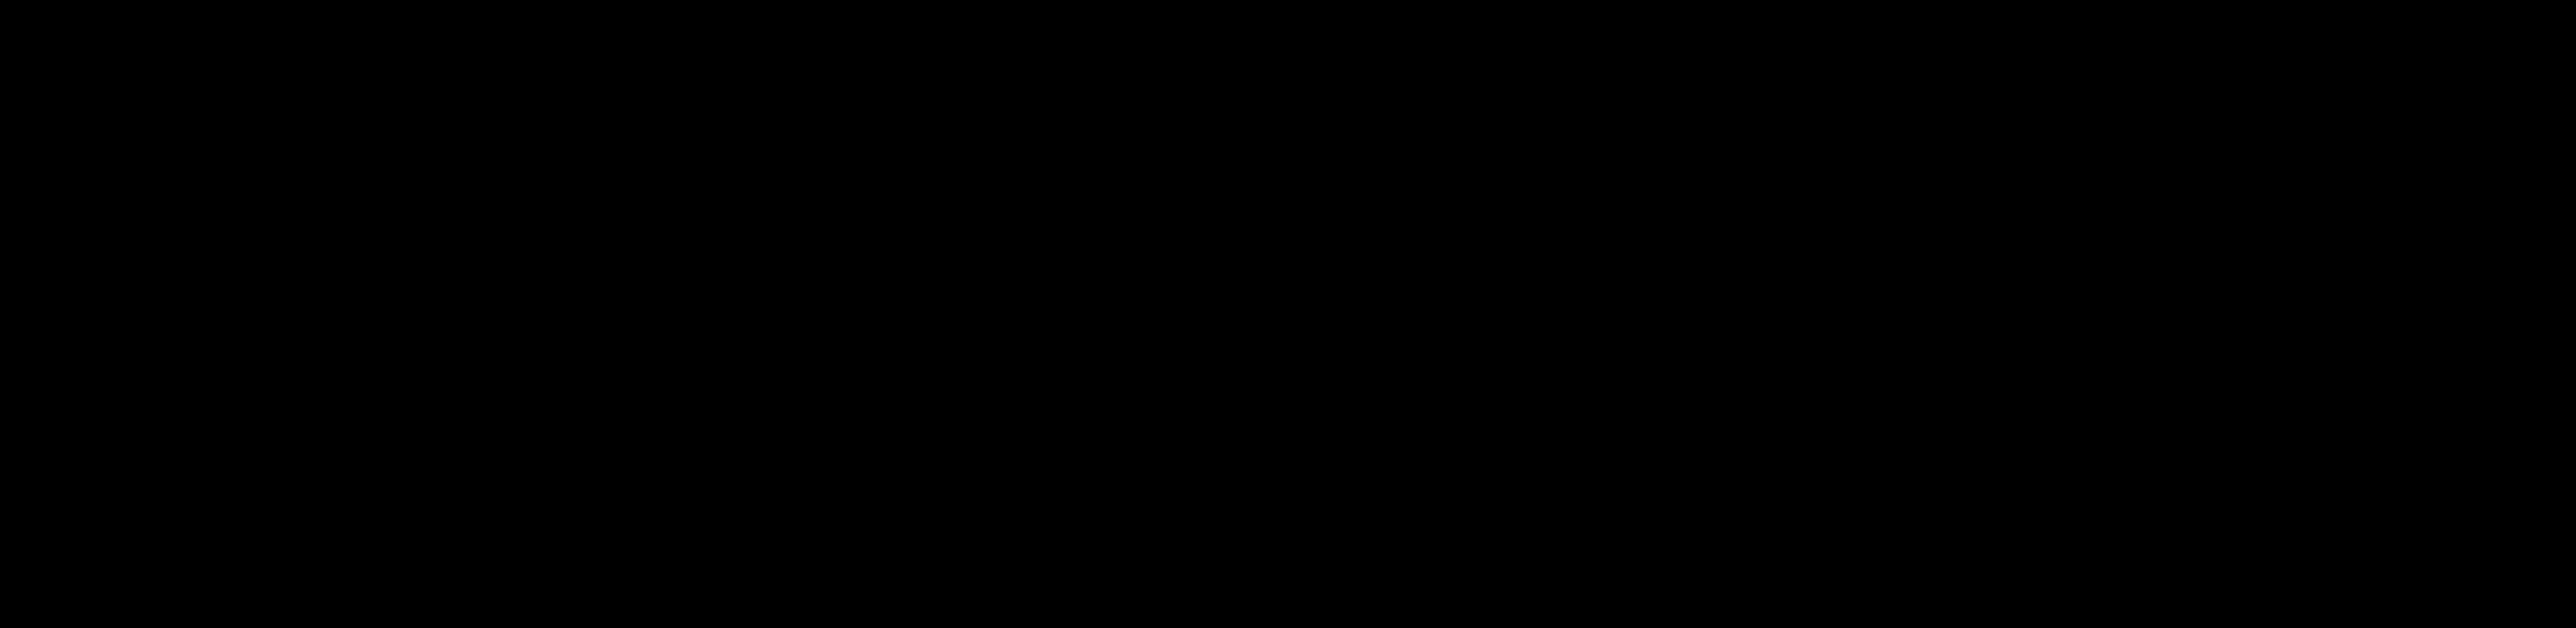 Black logo - no background (002)